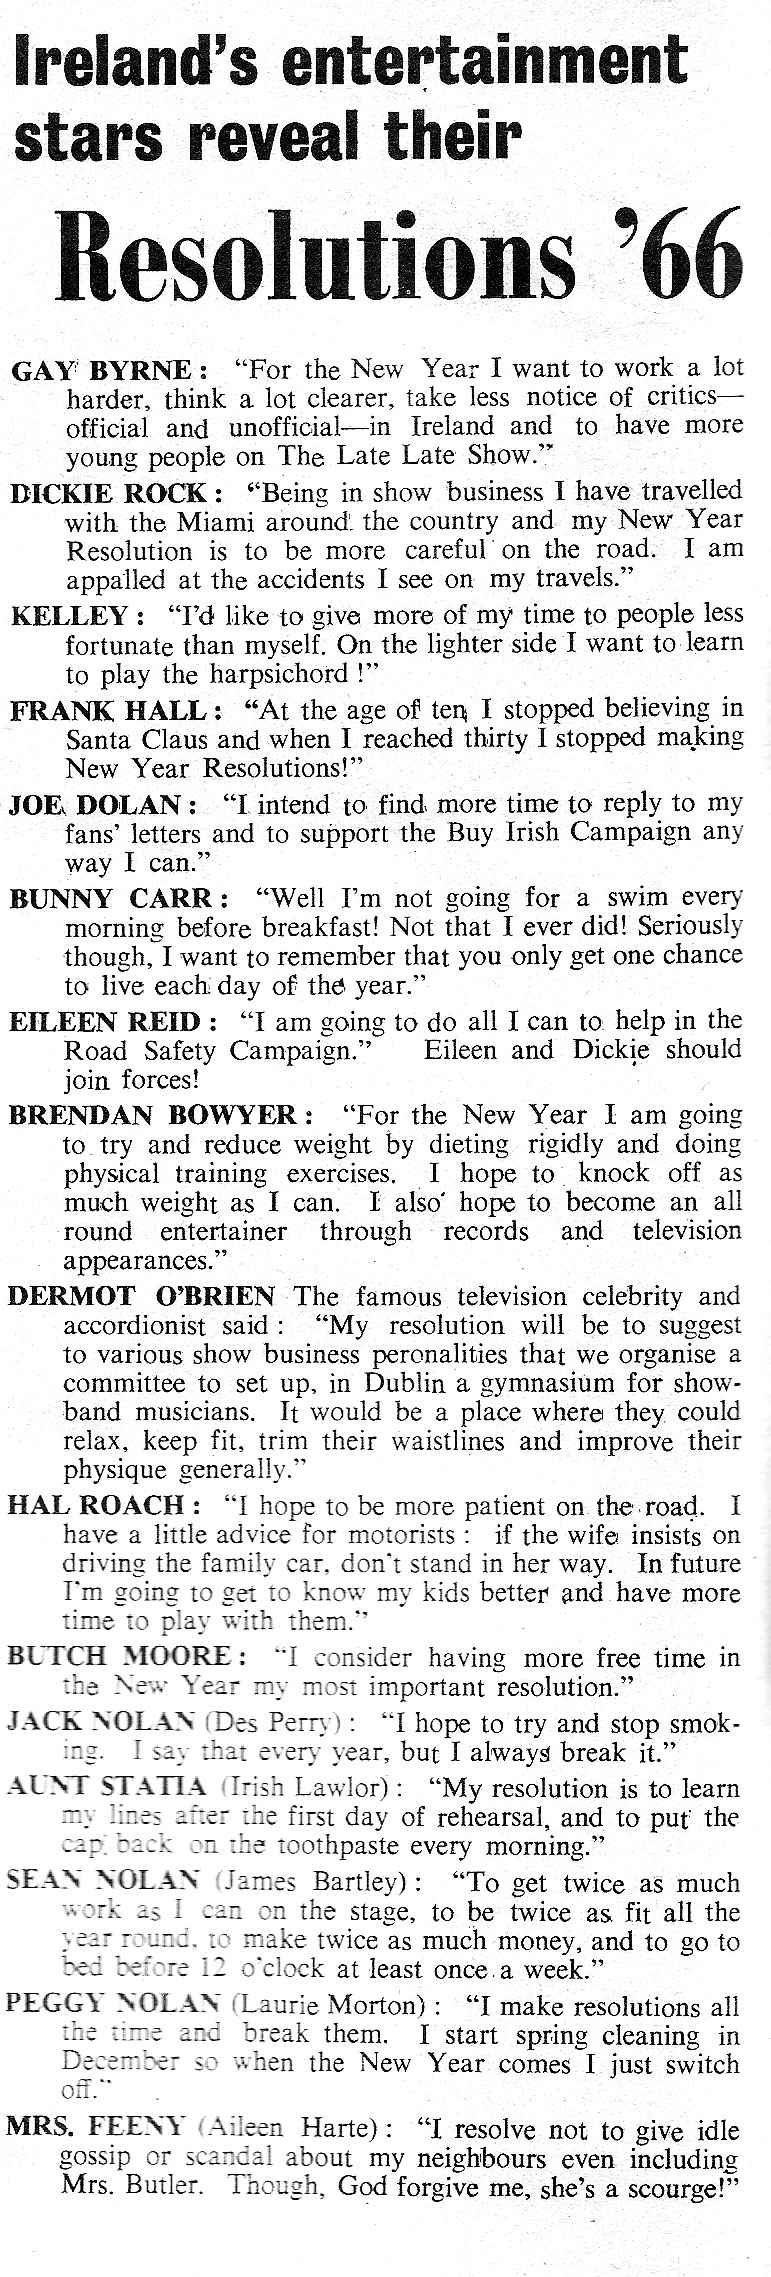 1966 new year resolutions irish showbiz